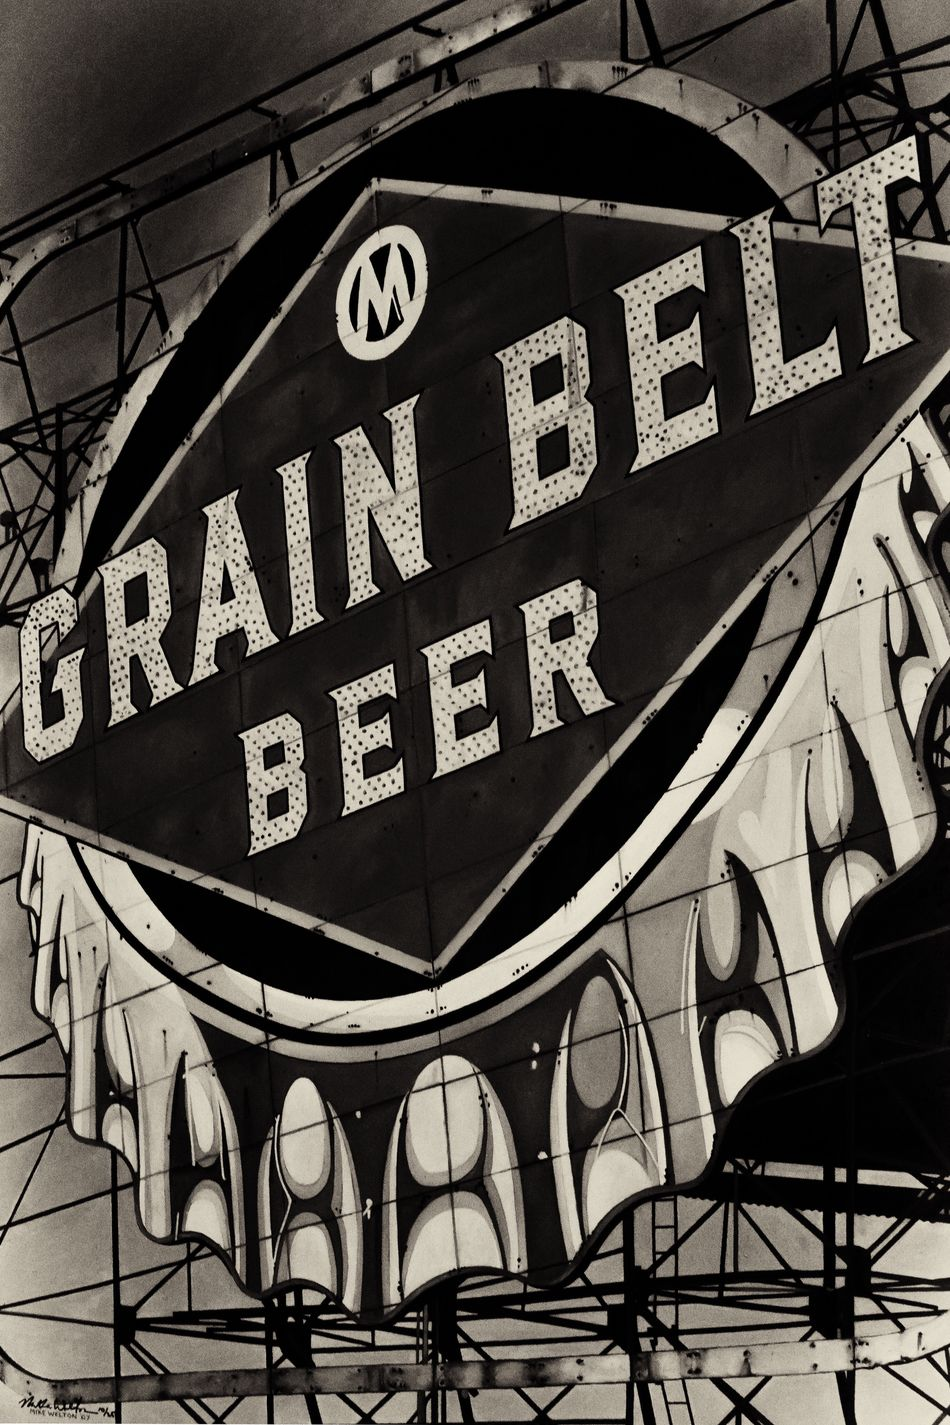 Grain Belt B&W Grain Belt Beer Blackandwhite Black And White Black & White High Contrast Painting Urban Urban Landscape Urbanphotography Cool Check This Out Sam Kratzer